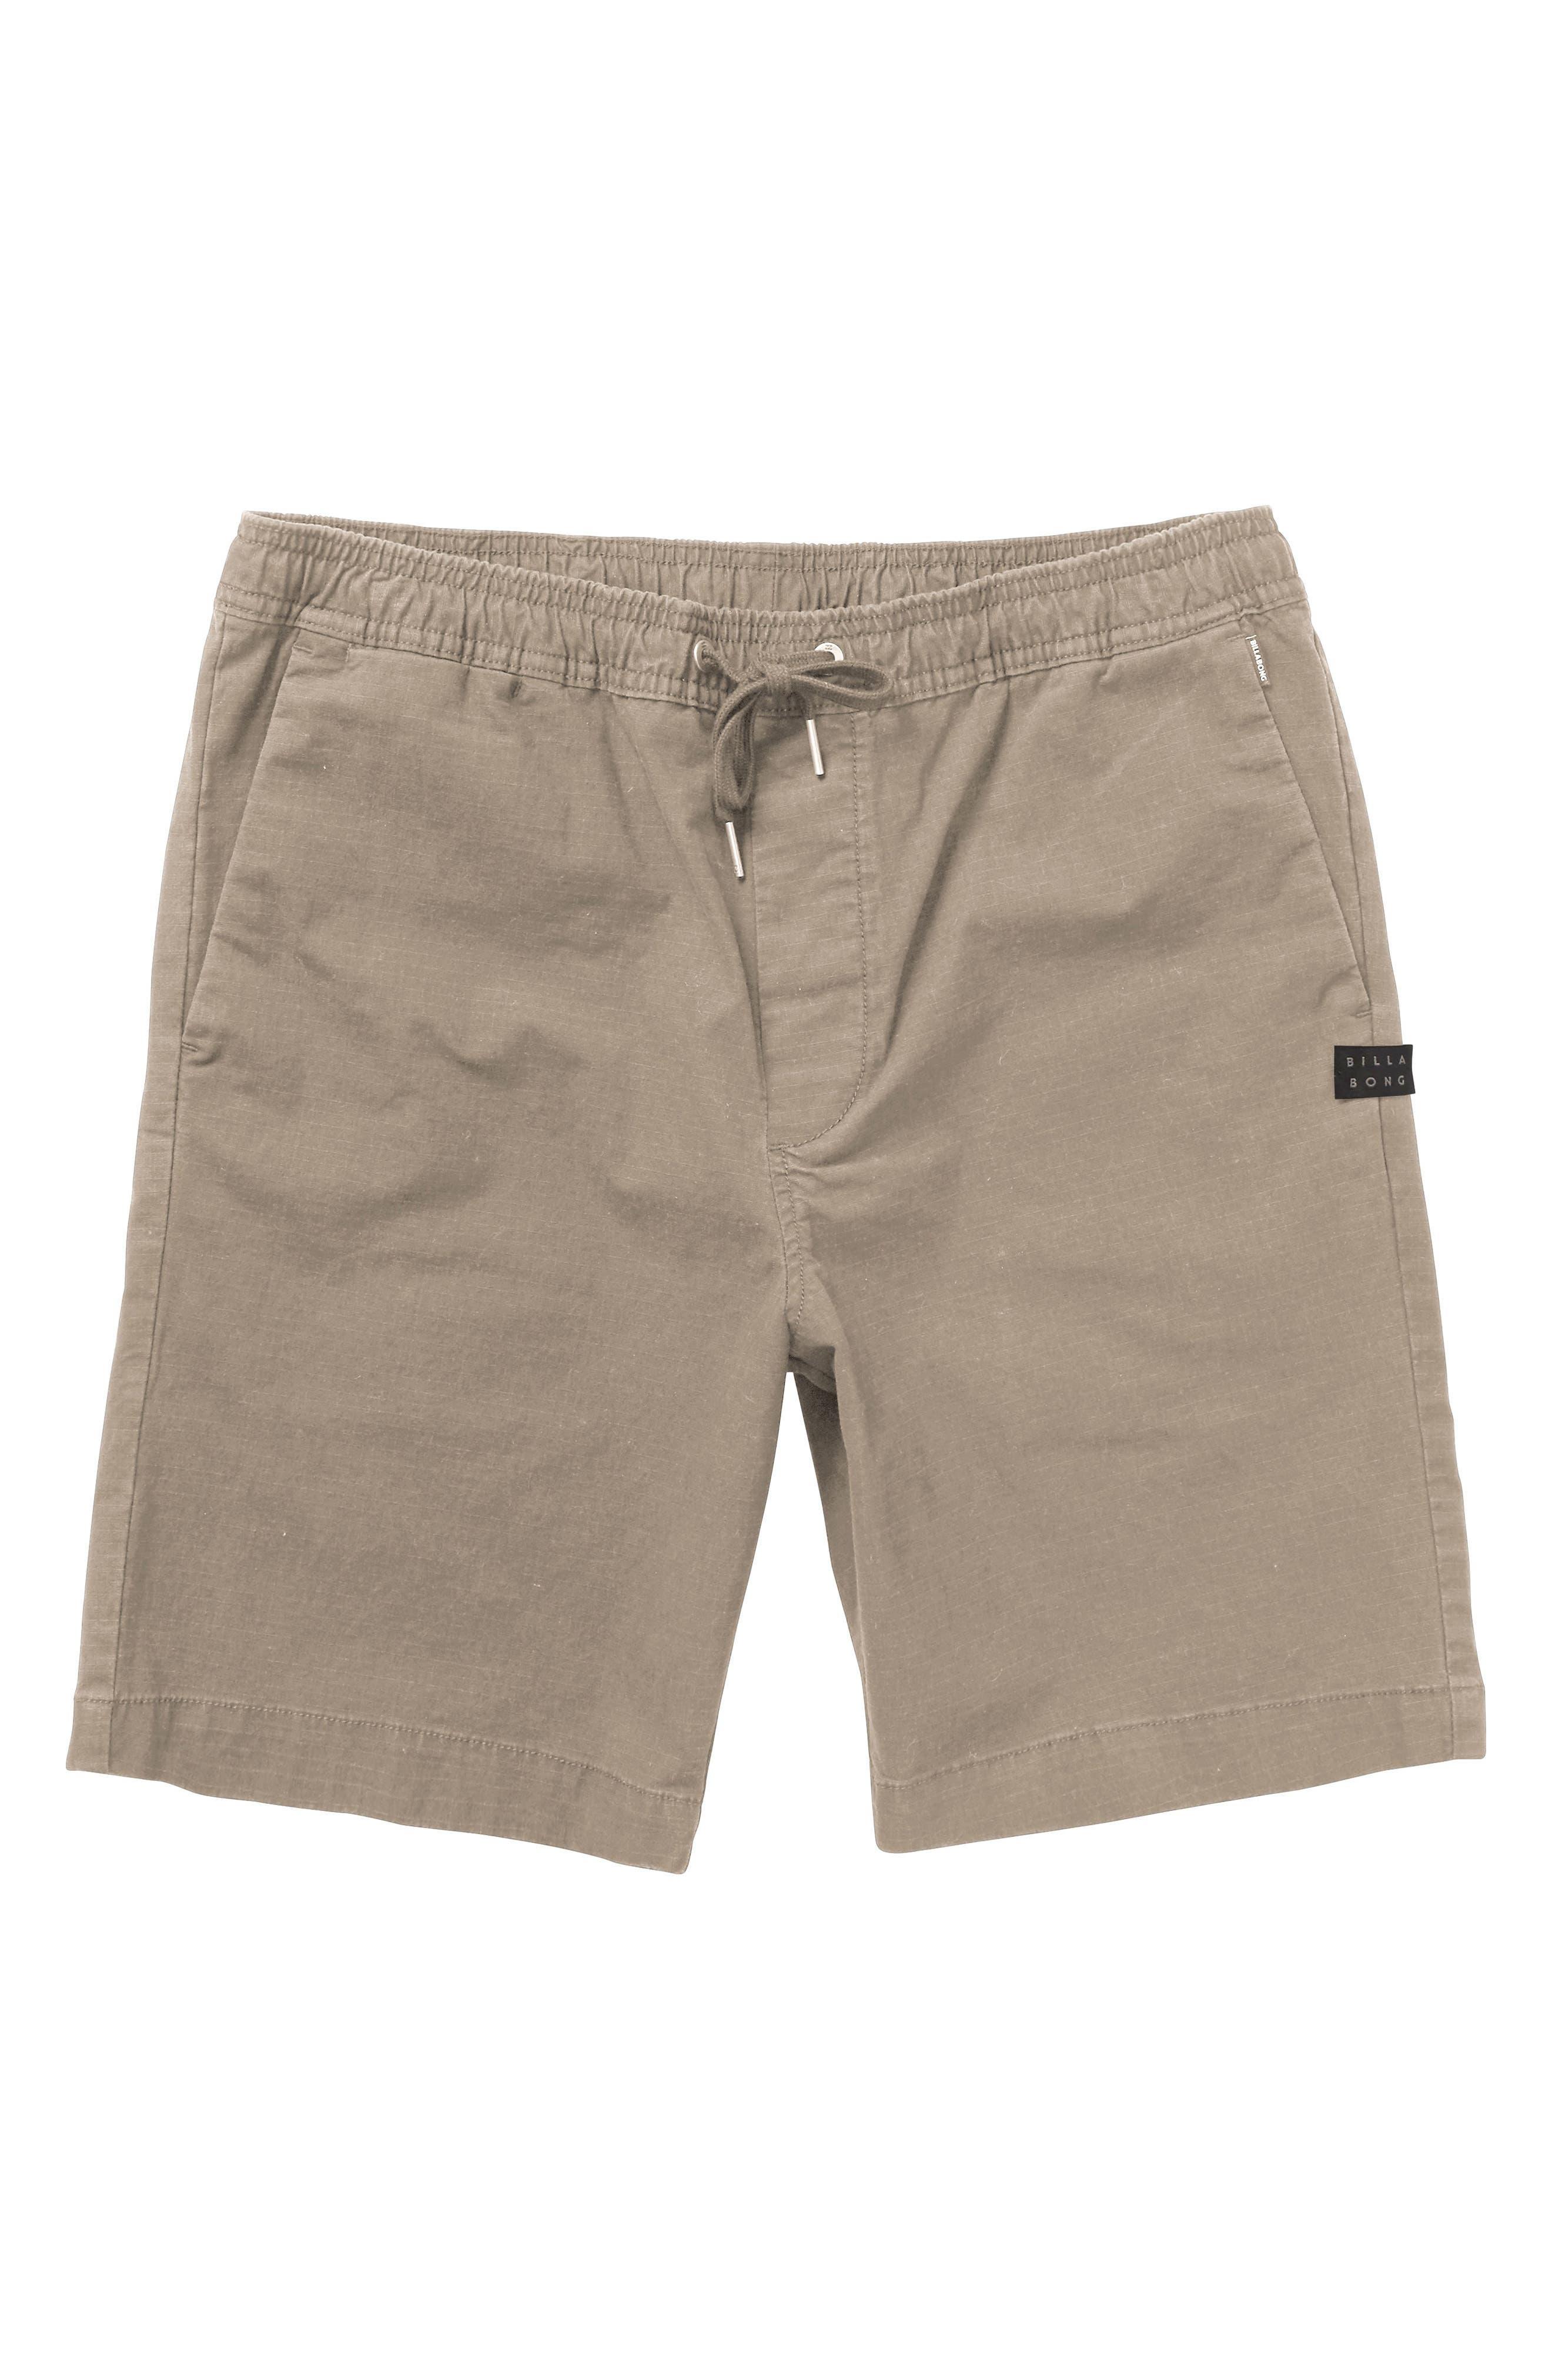 Larry Layback Shorts,                         Main,                         color, Light Khaki